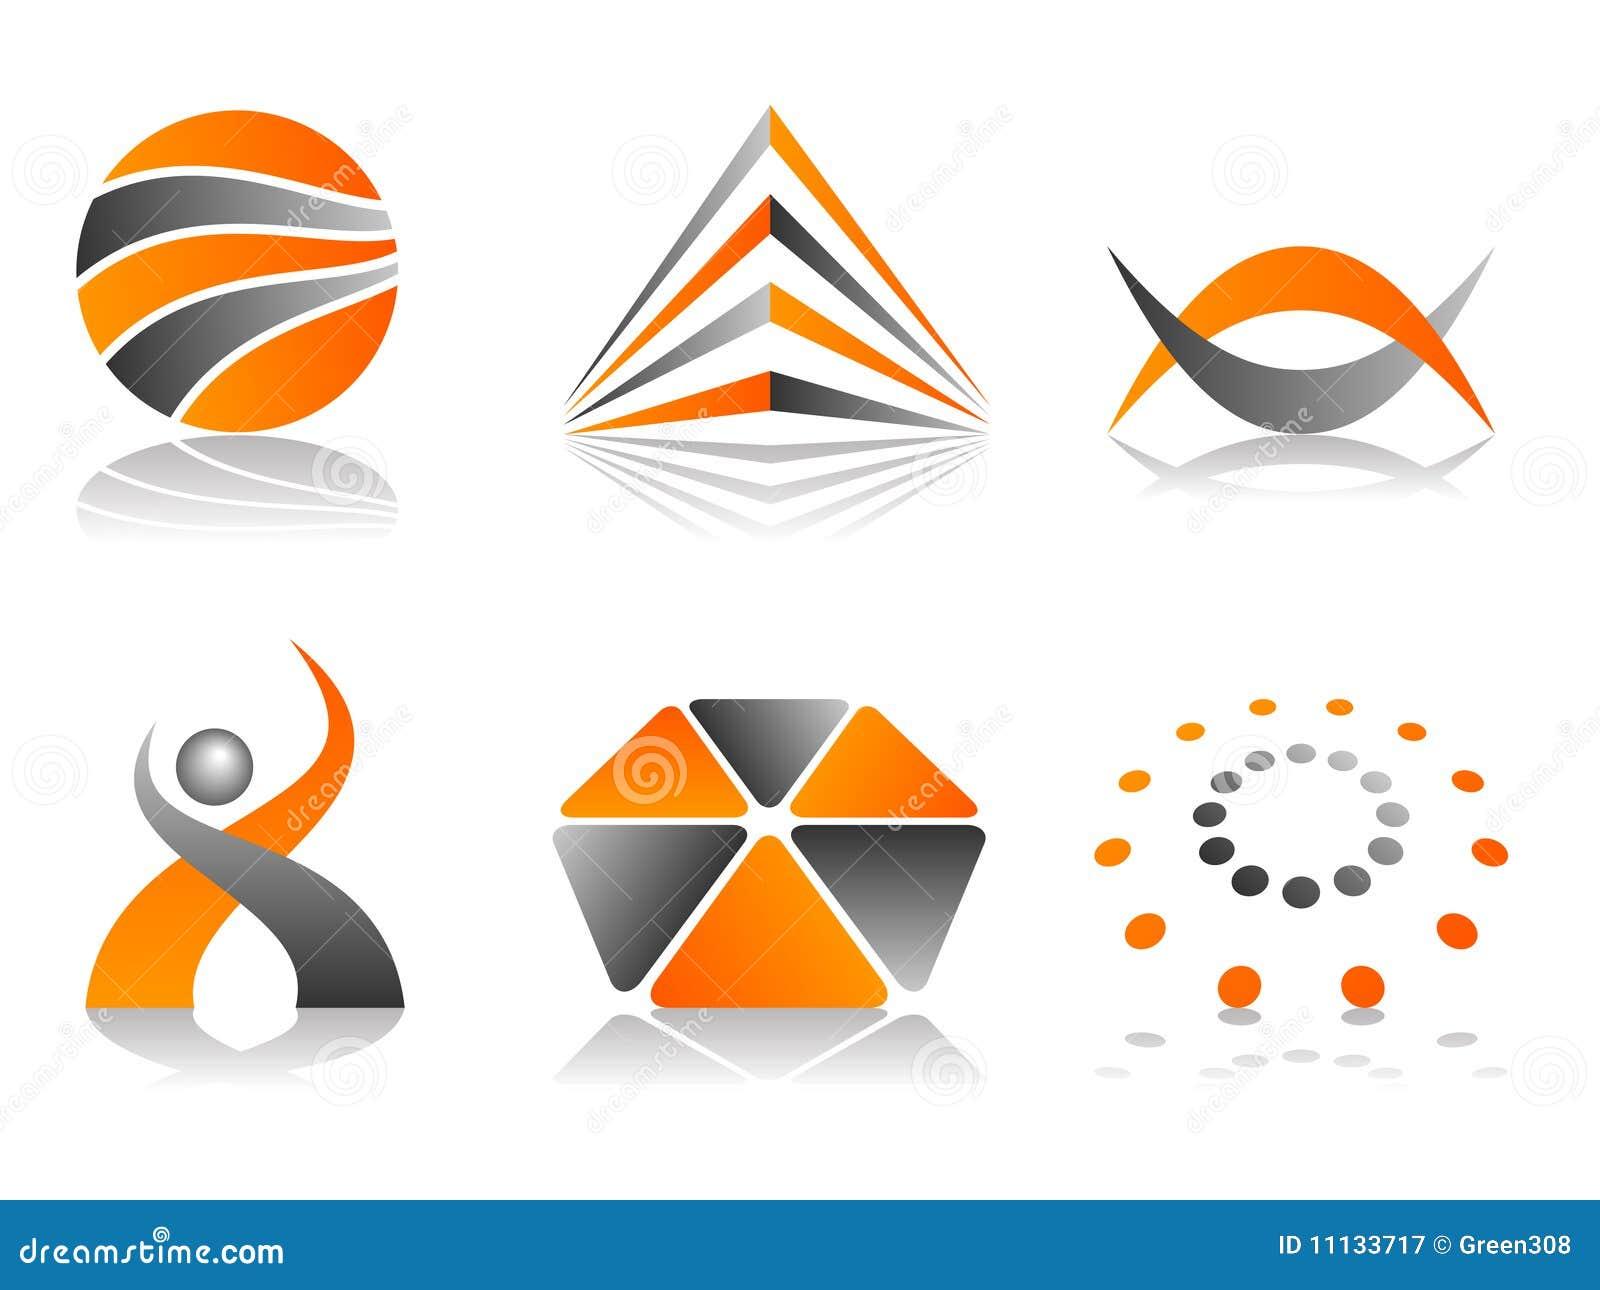 vector abstract logo icon design set stock vector illustration of